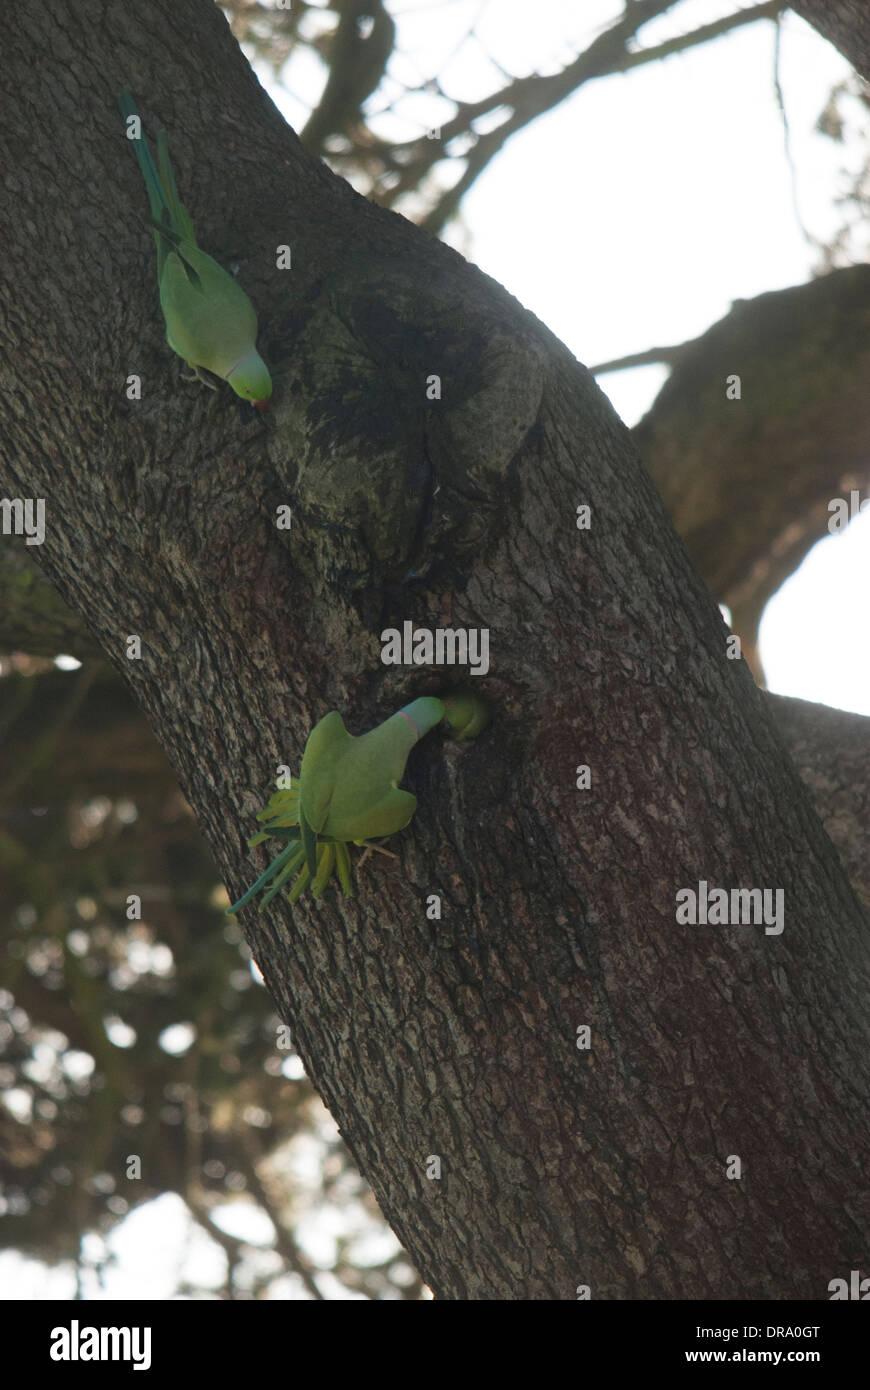 Ring Necked Parakeets (Psittacula krameri) at a nesting sight during Winter, unusual behavior. - Gunnersbury Park Stock Photo